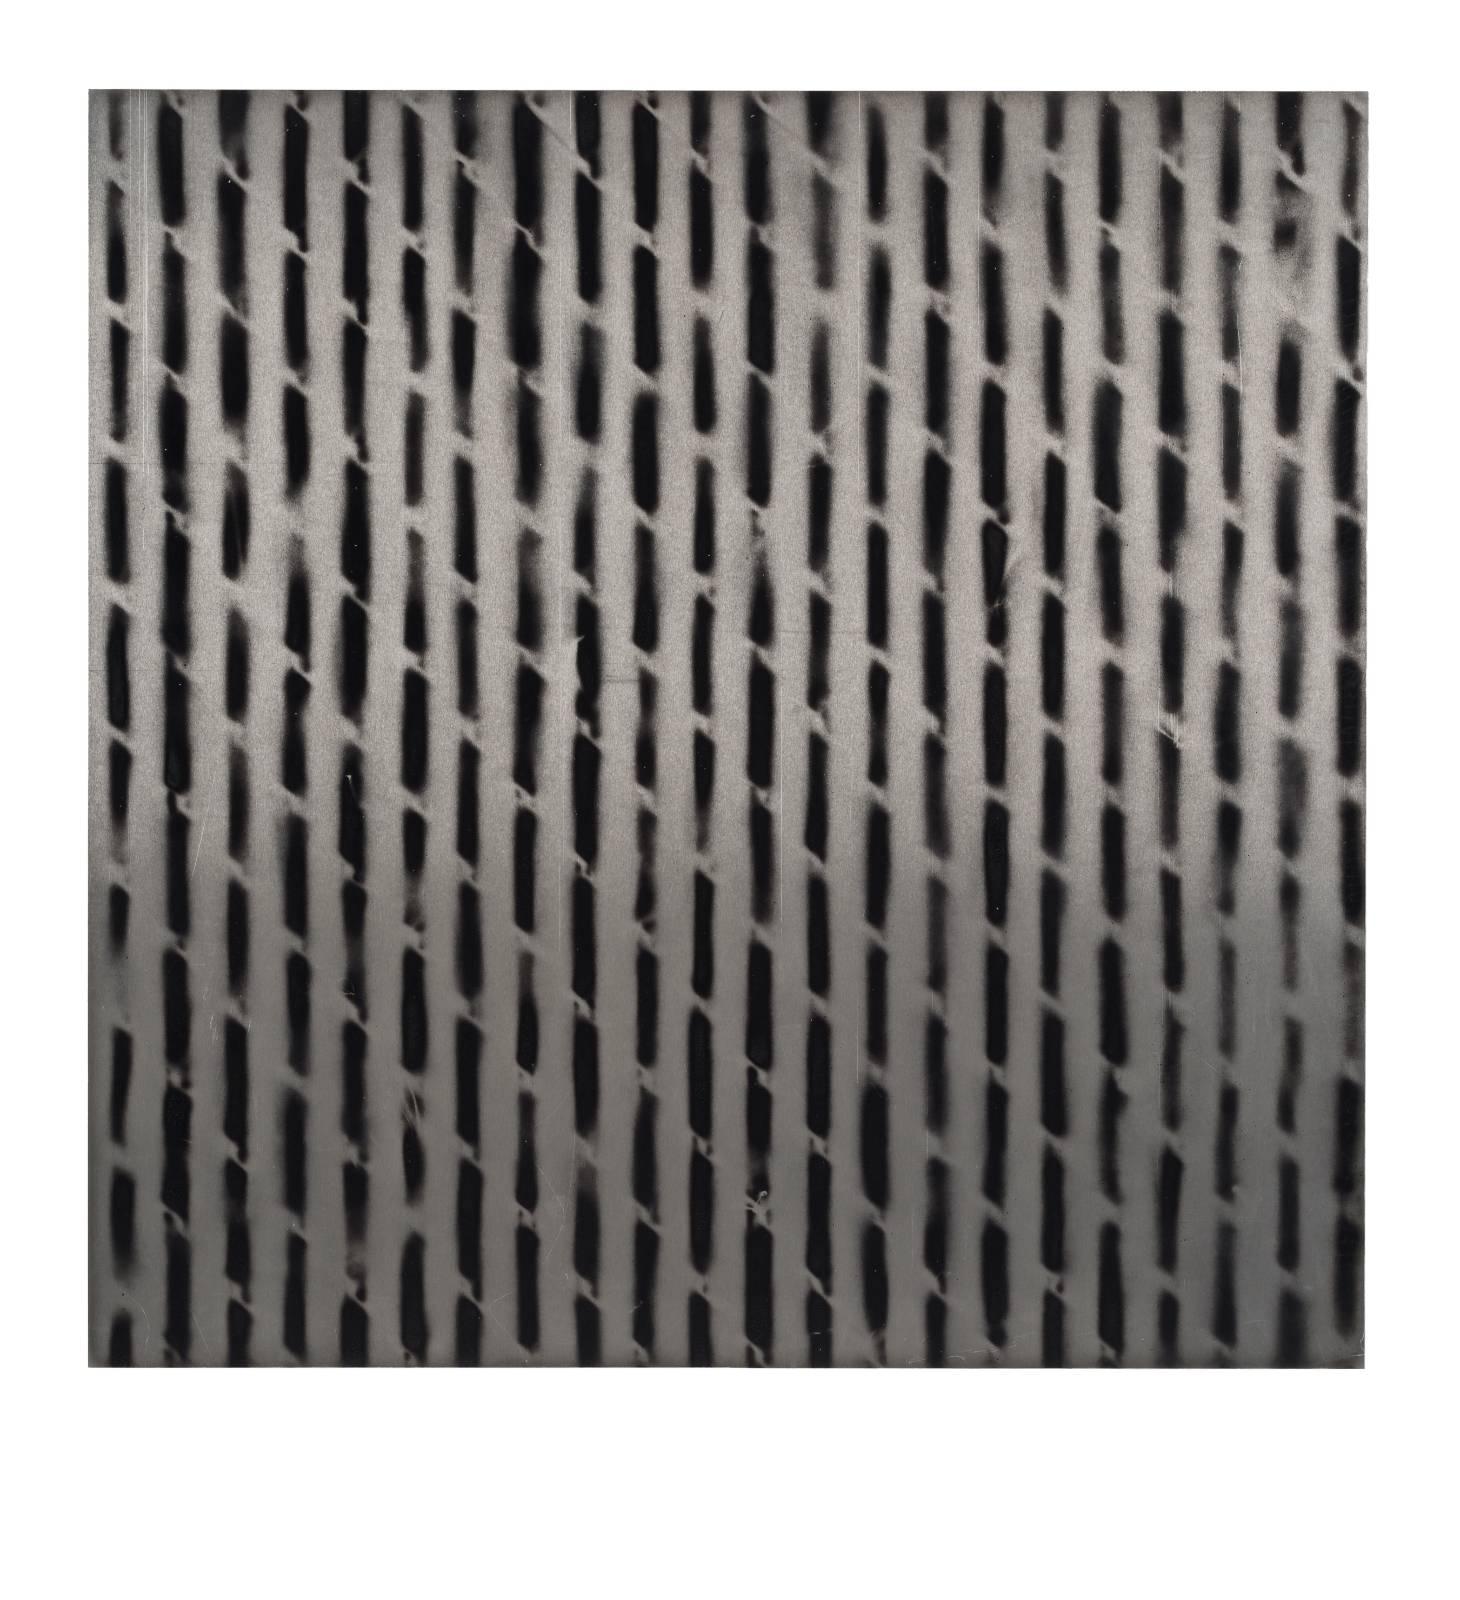 "STAIN : 40°42'51.1""N 73°56'01.1""W, 2015, spraypaint on aluminium, 81,3 x 81,3 cm"